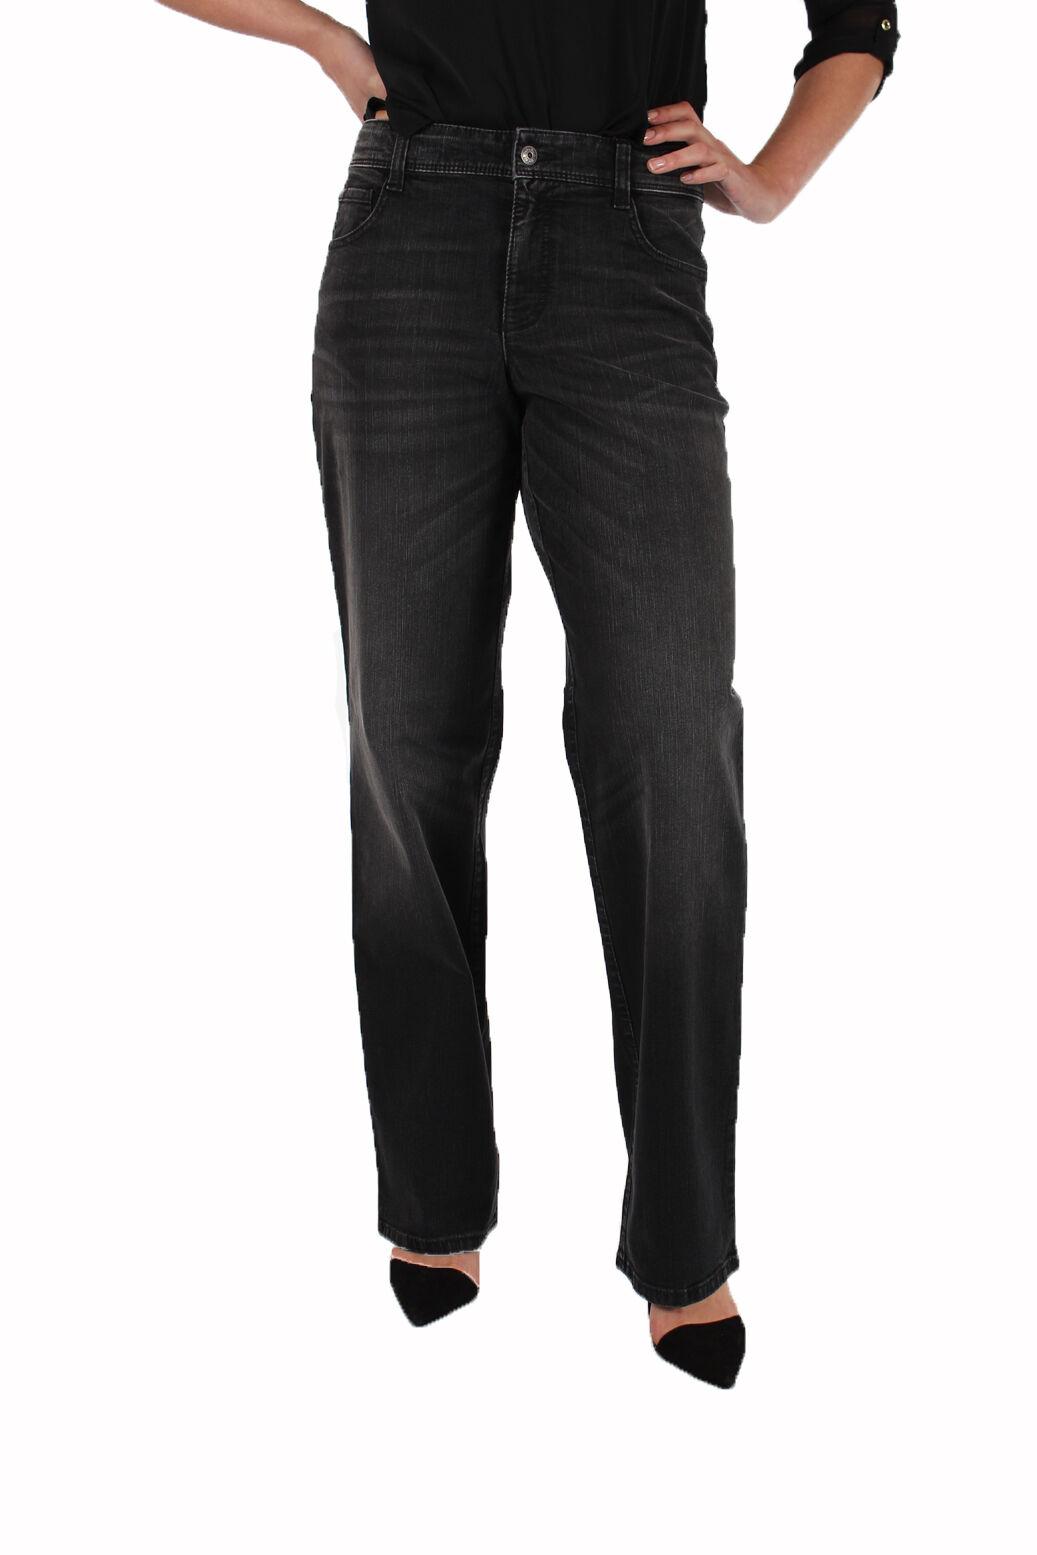 MAC Jeans Angela Angela Angela Damen D922 (ID029) 2e8706